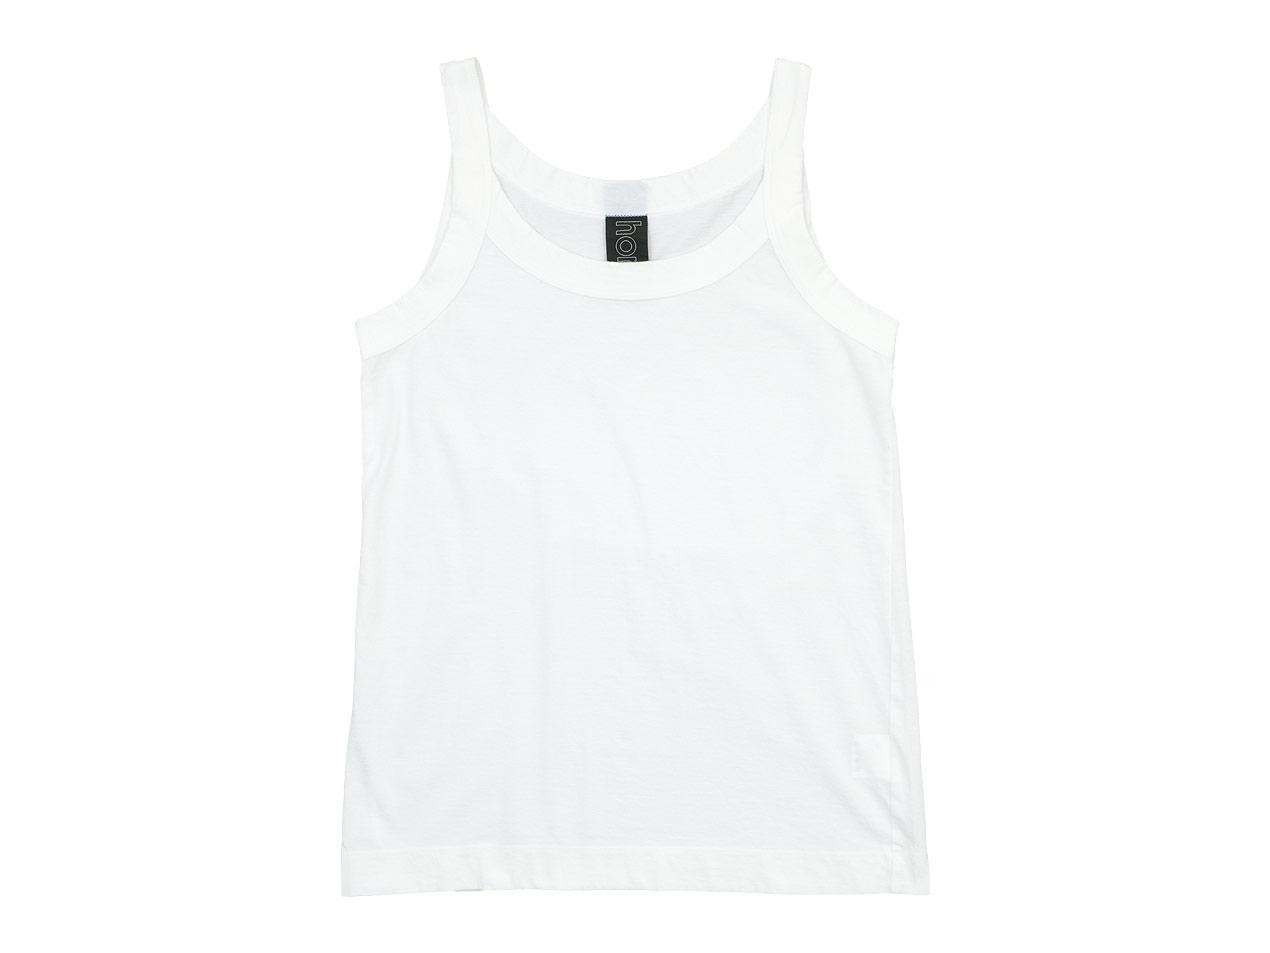 homspun 30/1天竺 キャミソール / フレンチスリーブTシャツ / 五分袖Tシャツ